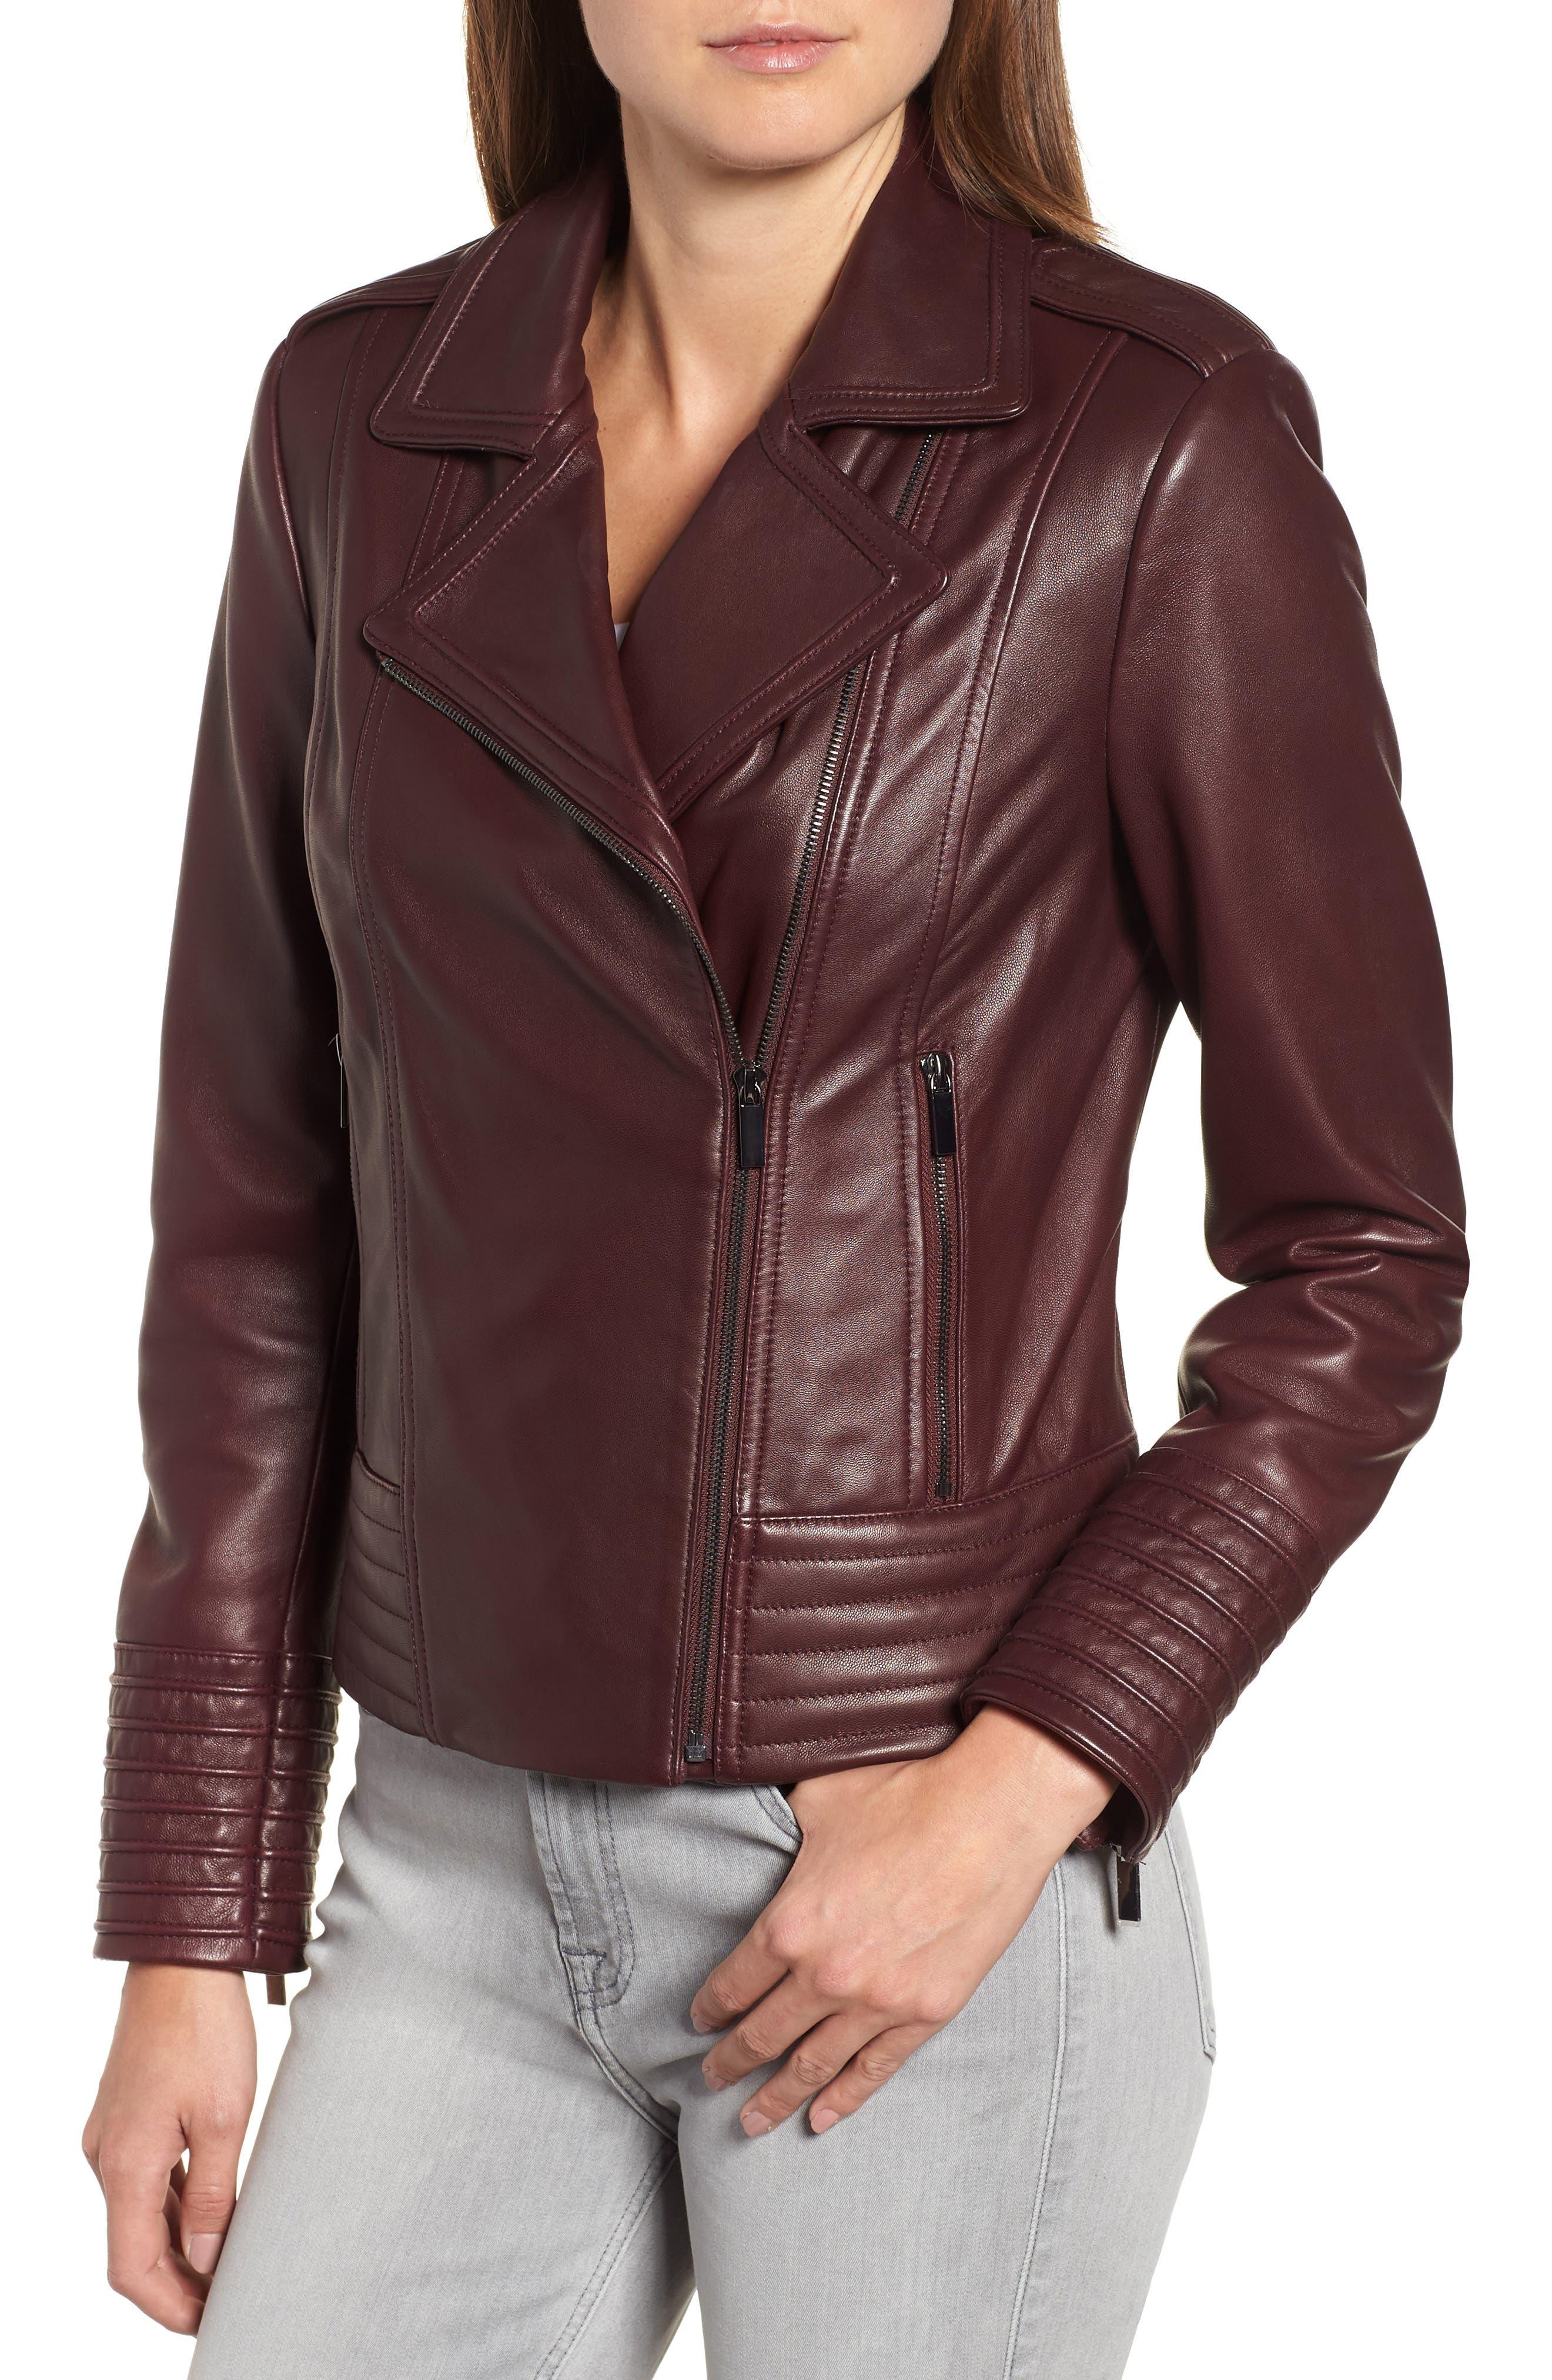 Gia Leather Biker Jacket,                             Alternate thumbnail 4, color,                             Burgundy